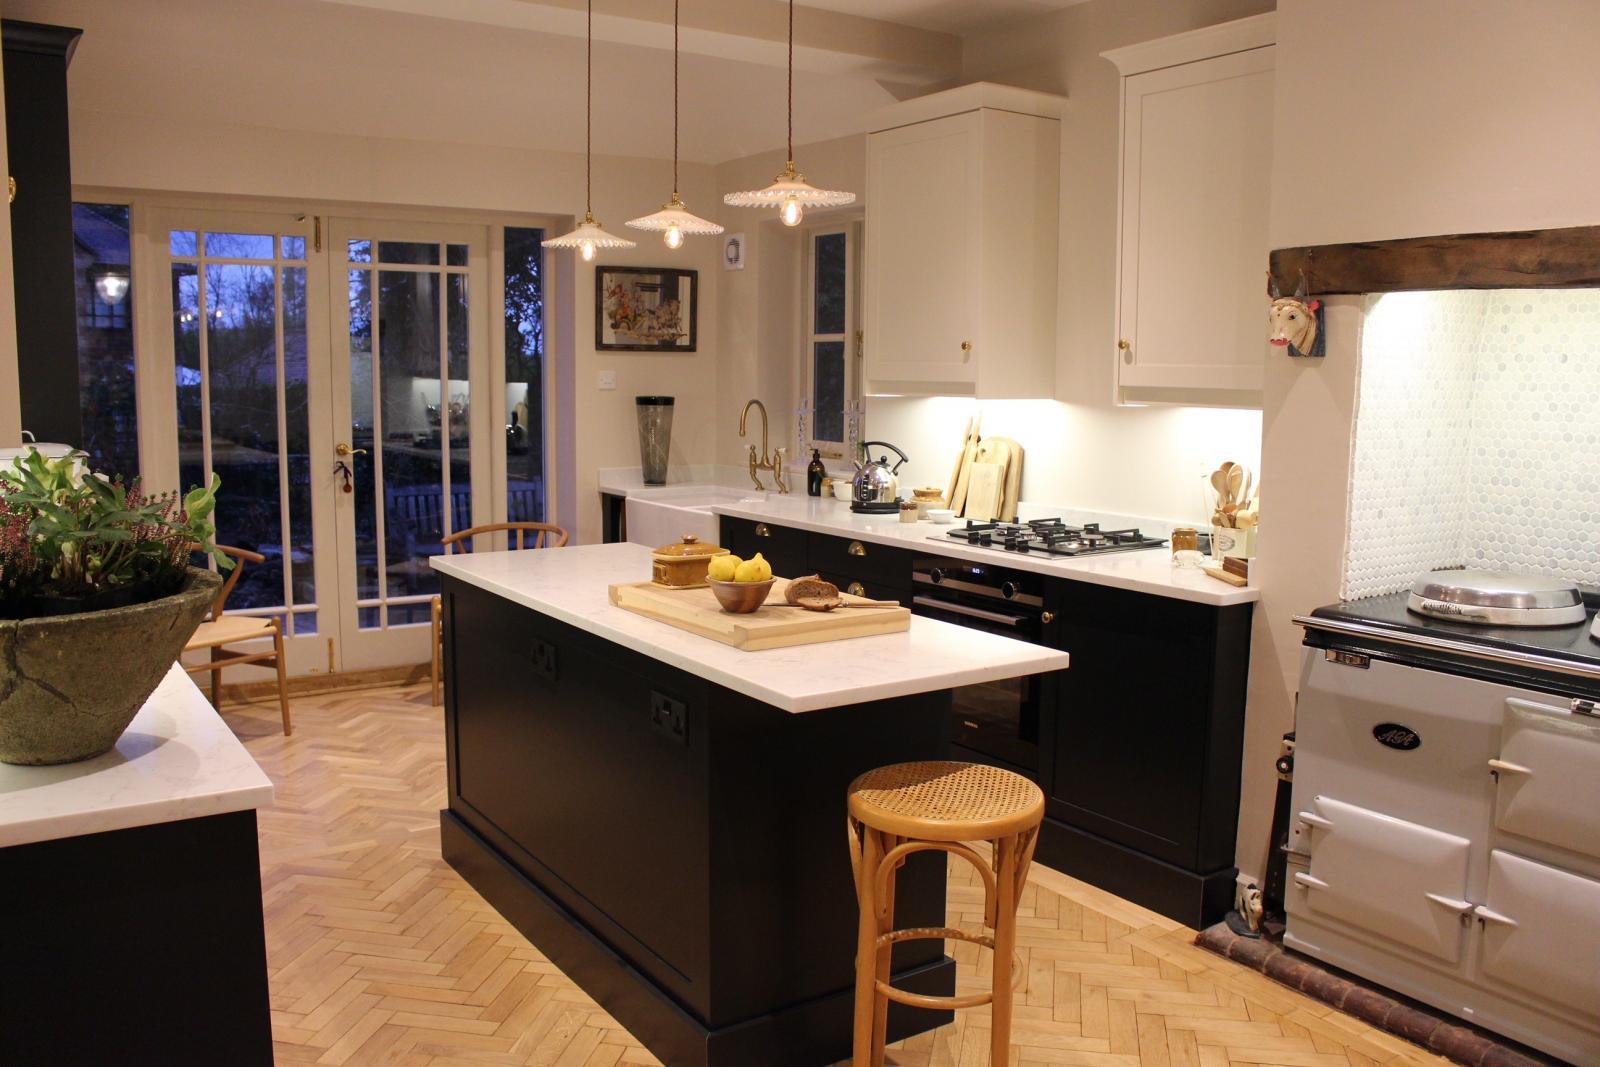 23+ Asian Kitchen Designs, Decorative Ideas | Design ...